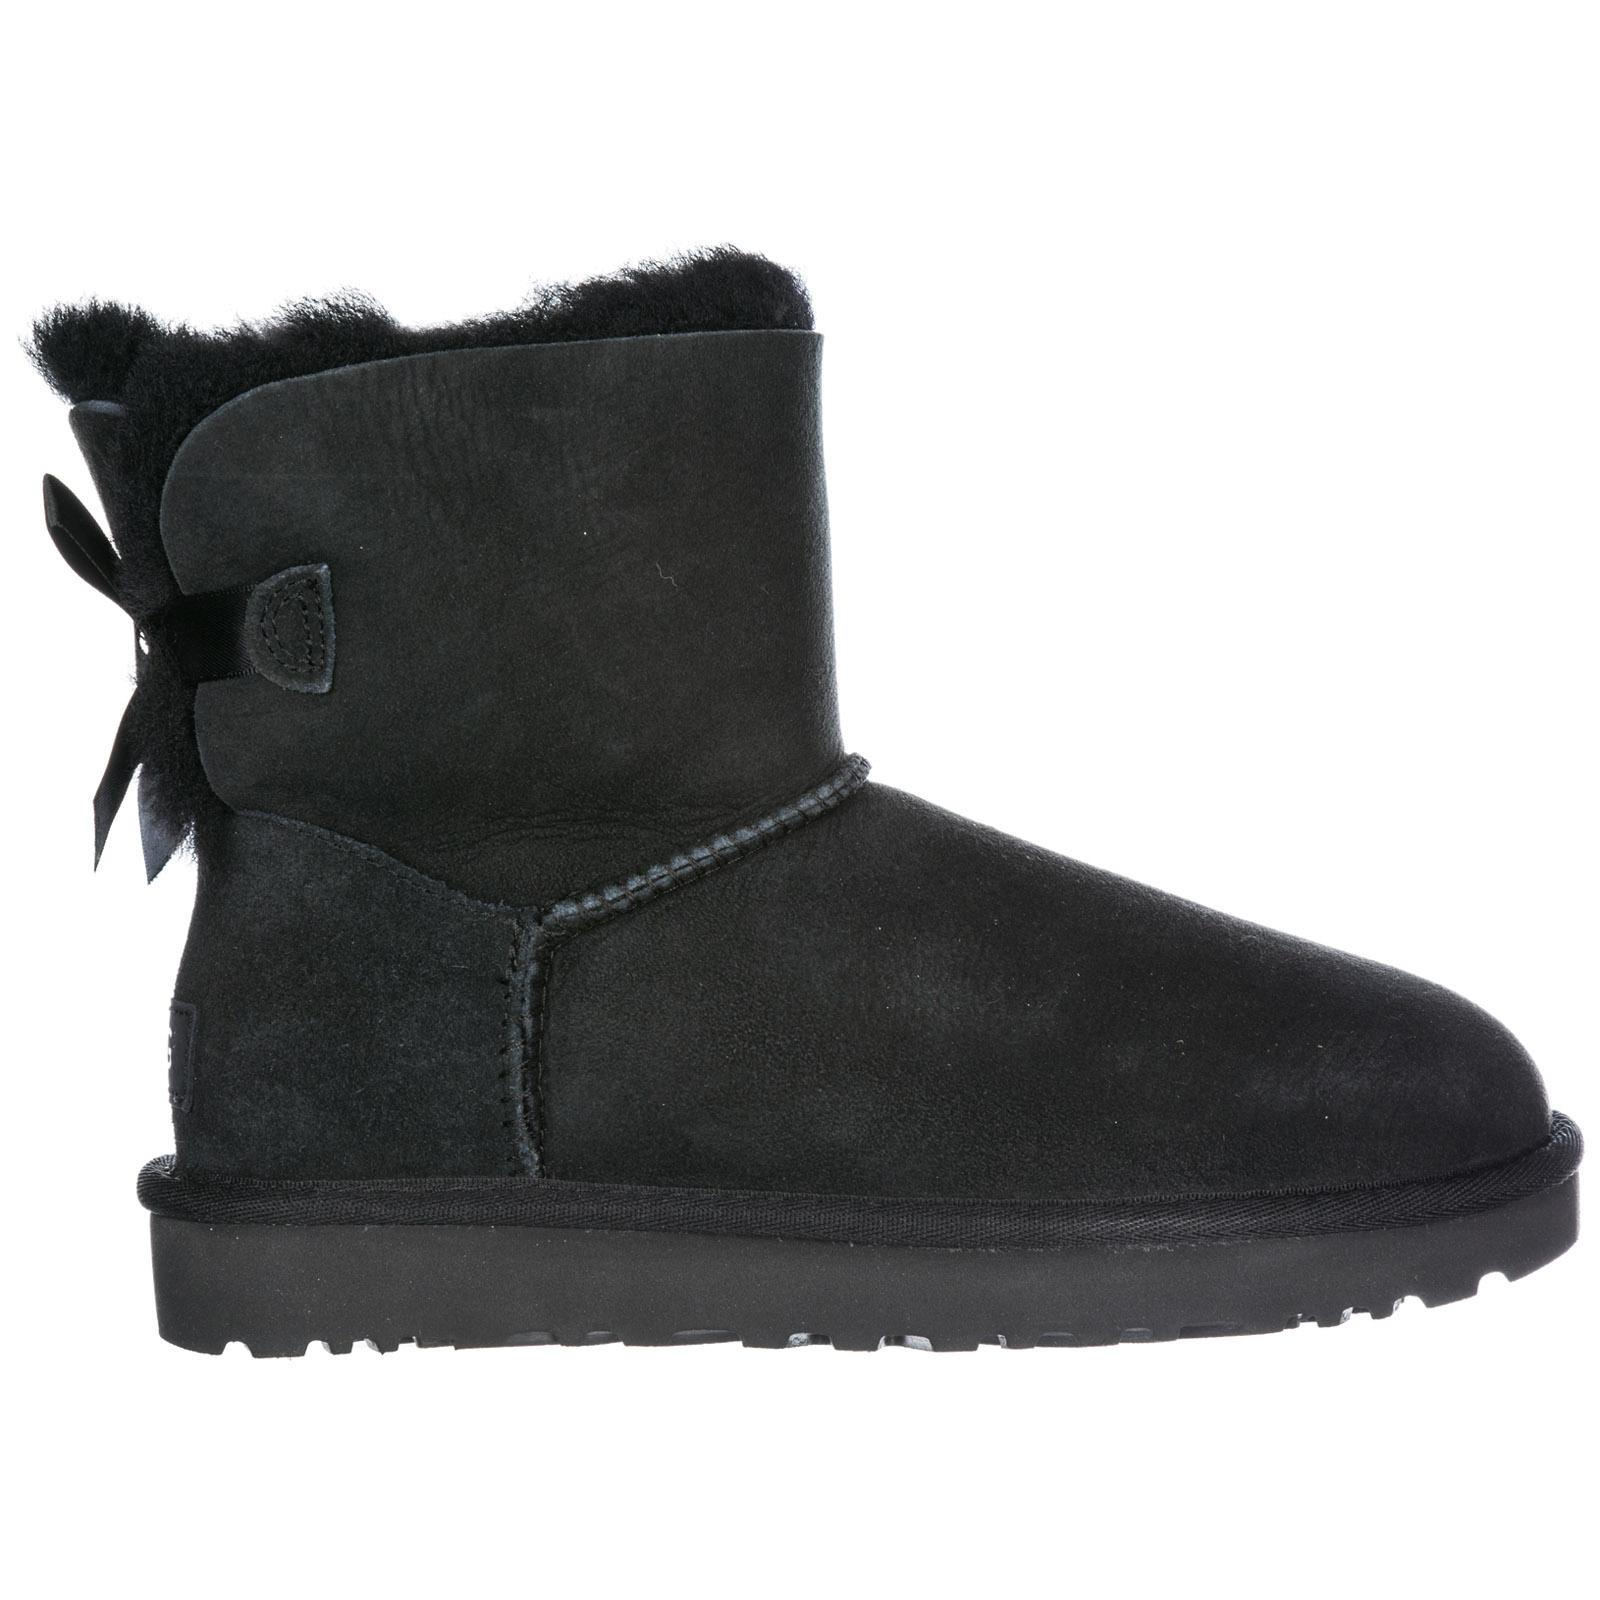 2ec51ae0c6b Women's suede boots mini bailey bow ii